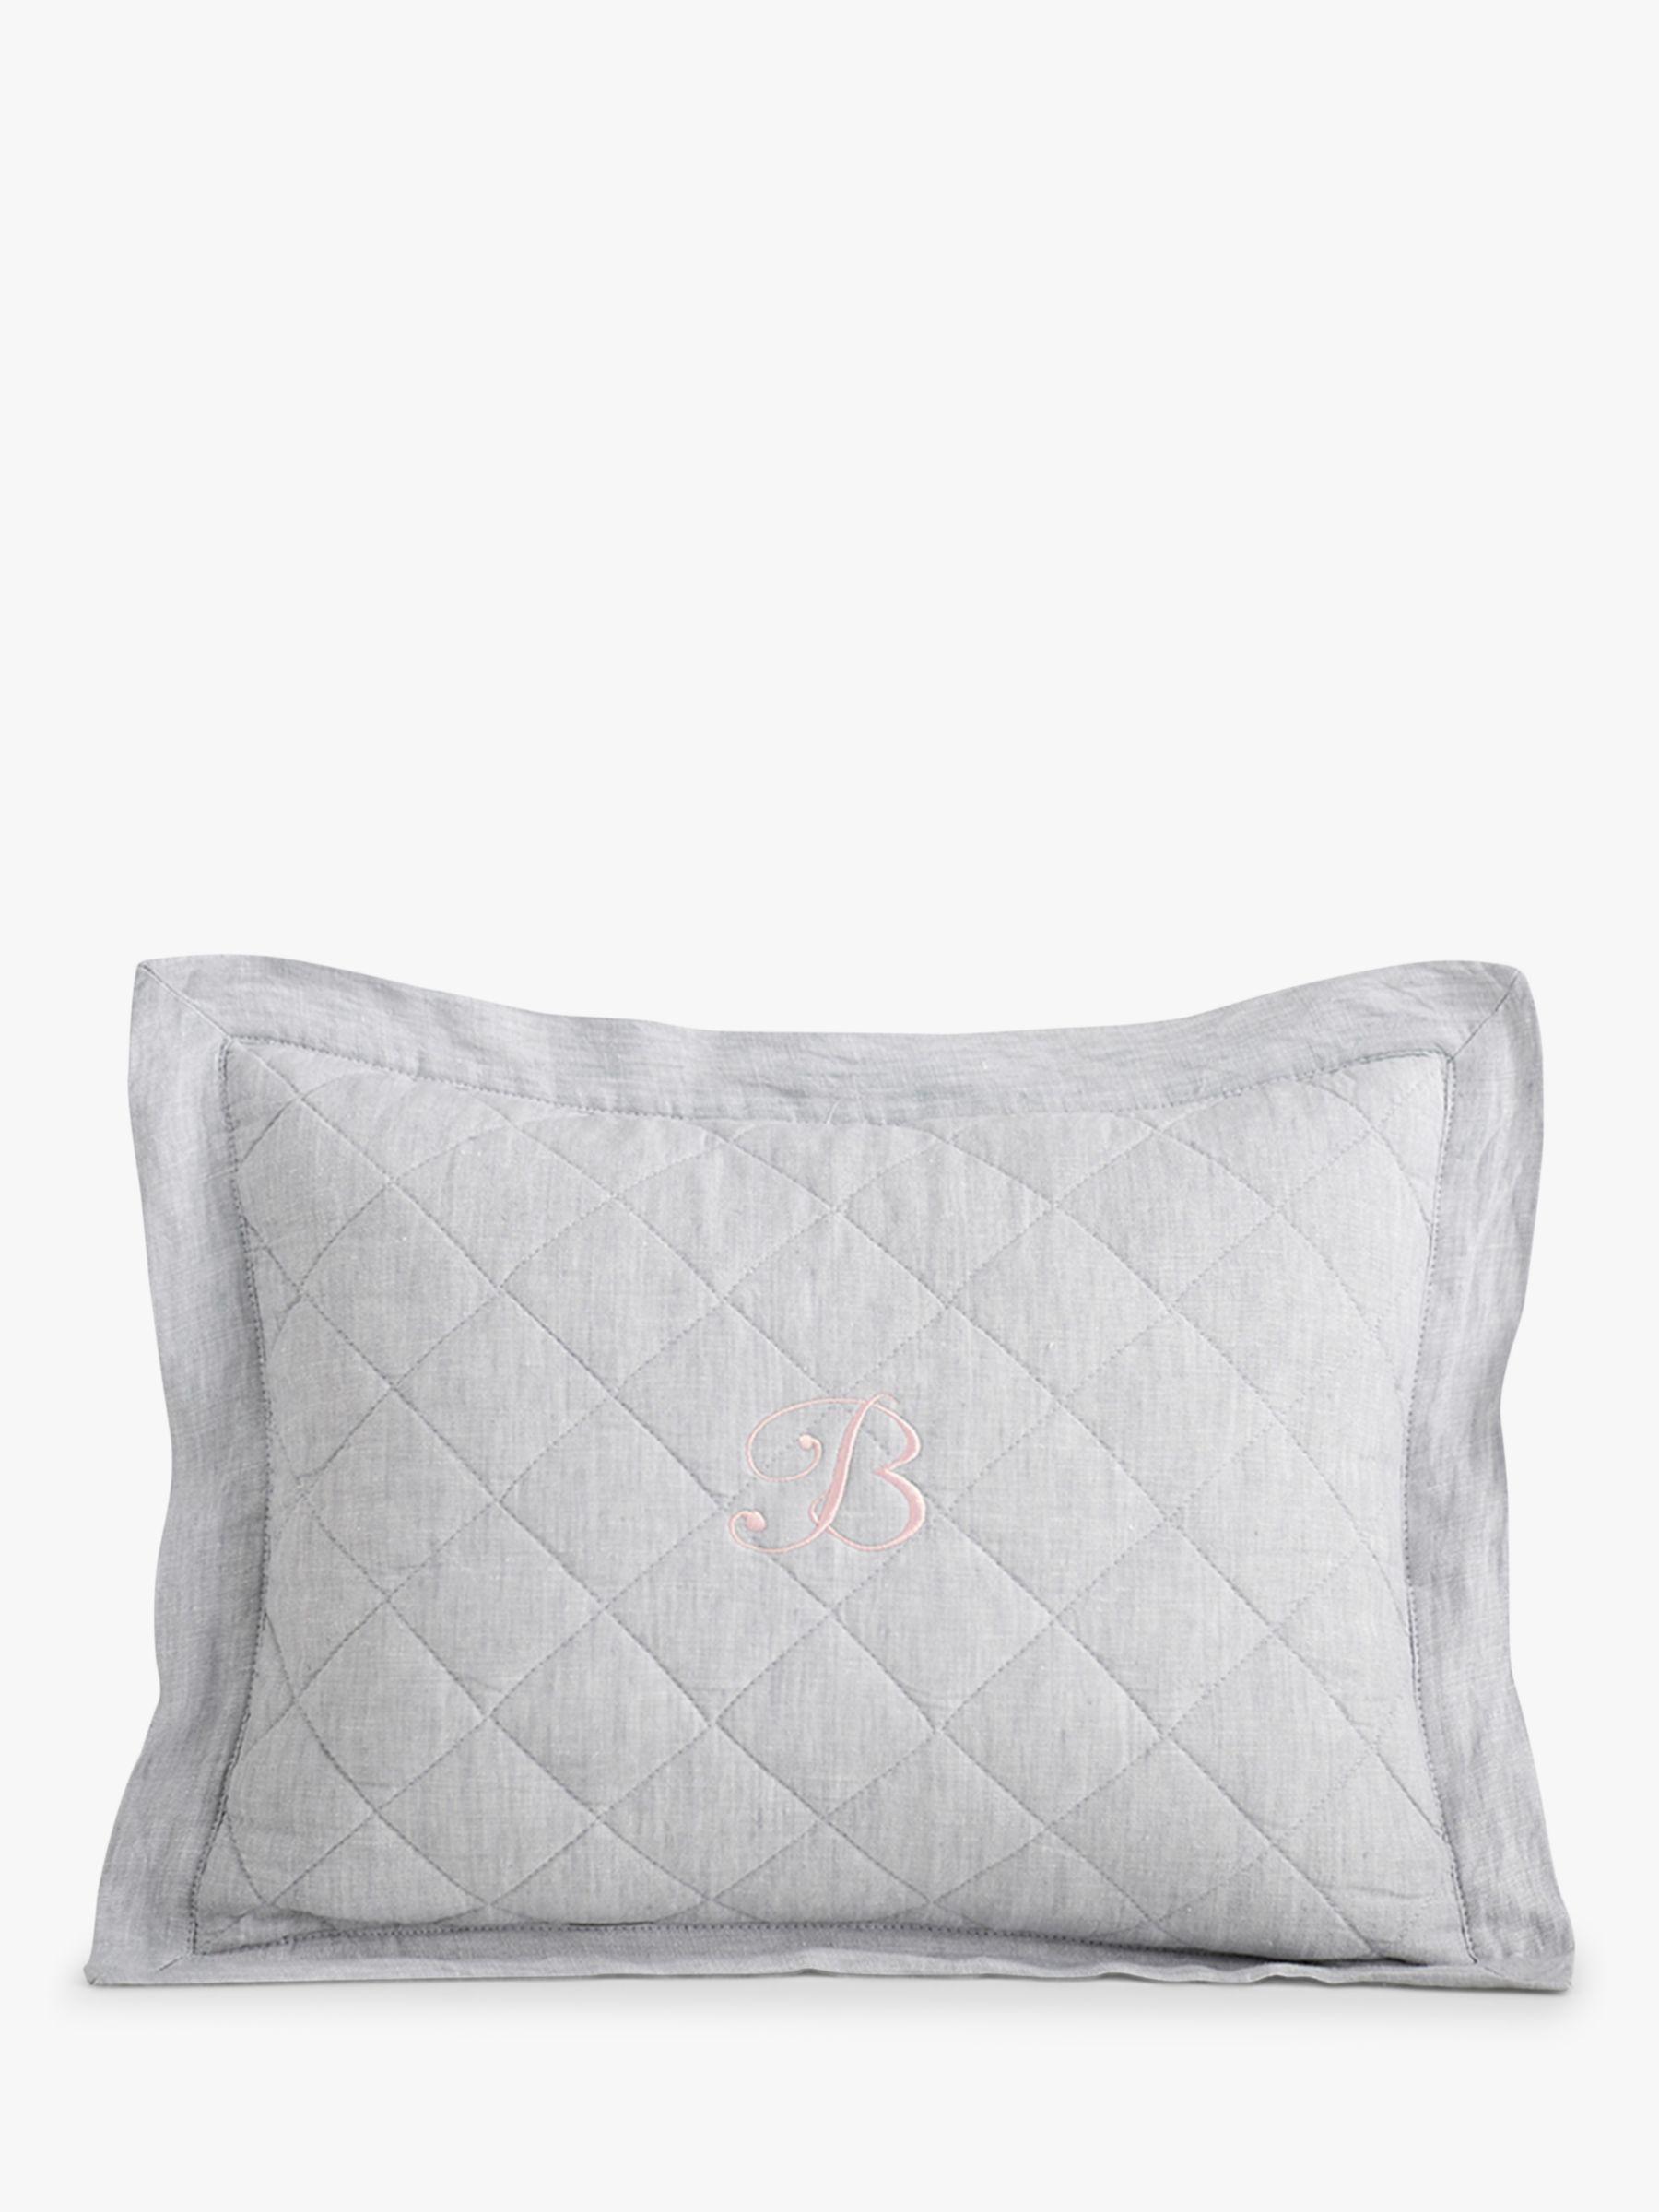 Pottery Barn Kids Linen Cushion Cover, Grey